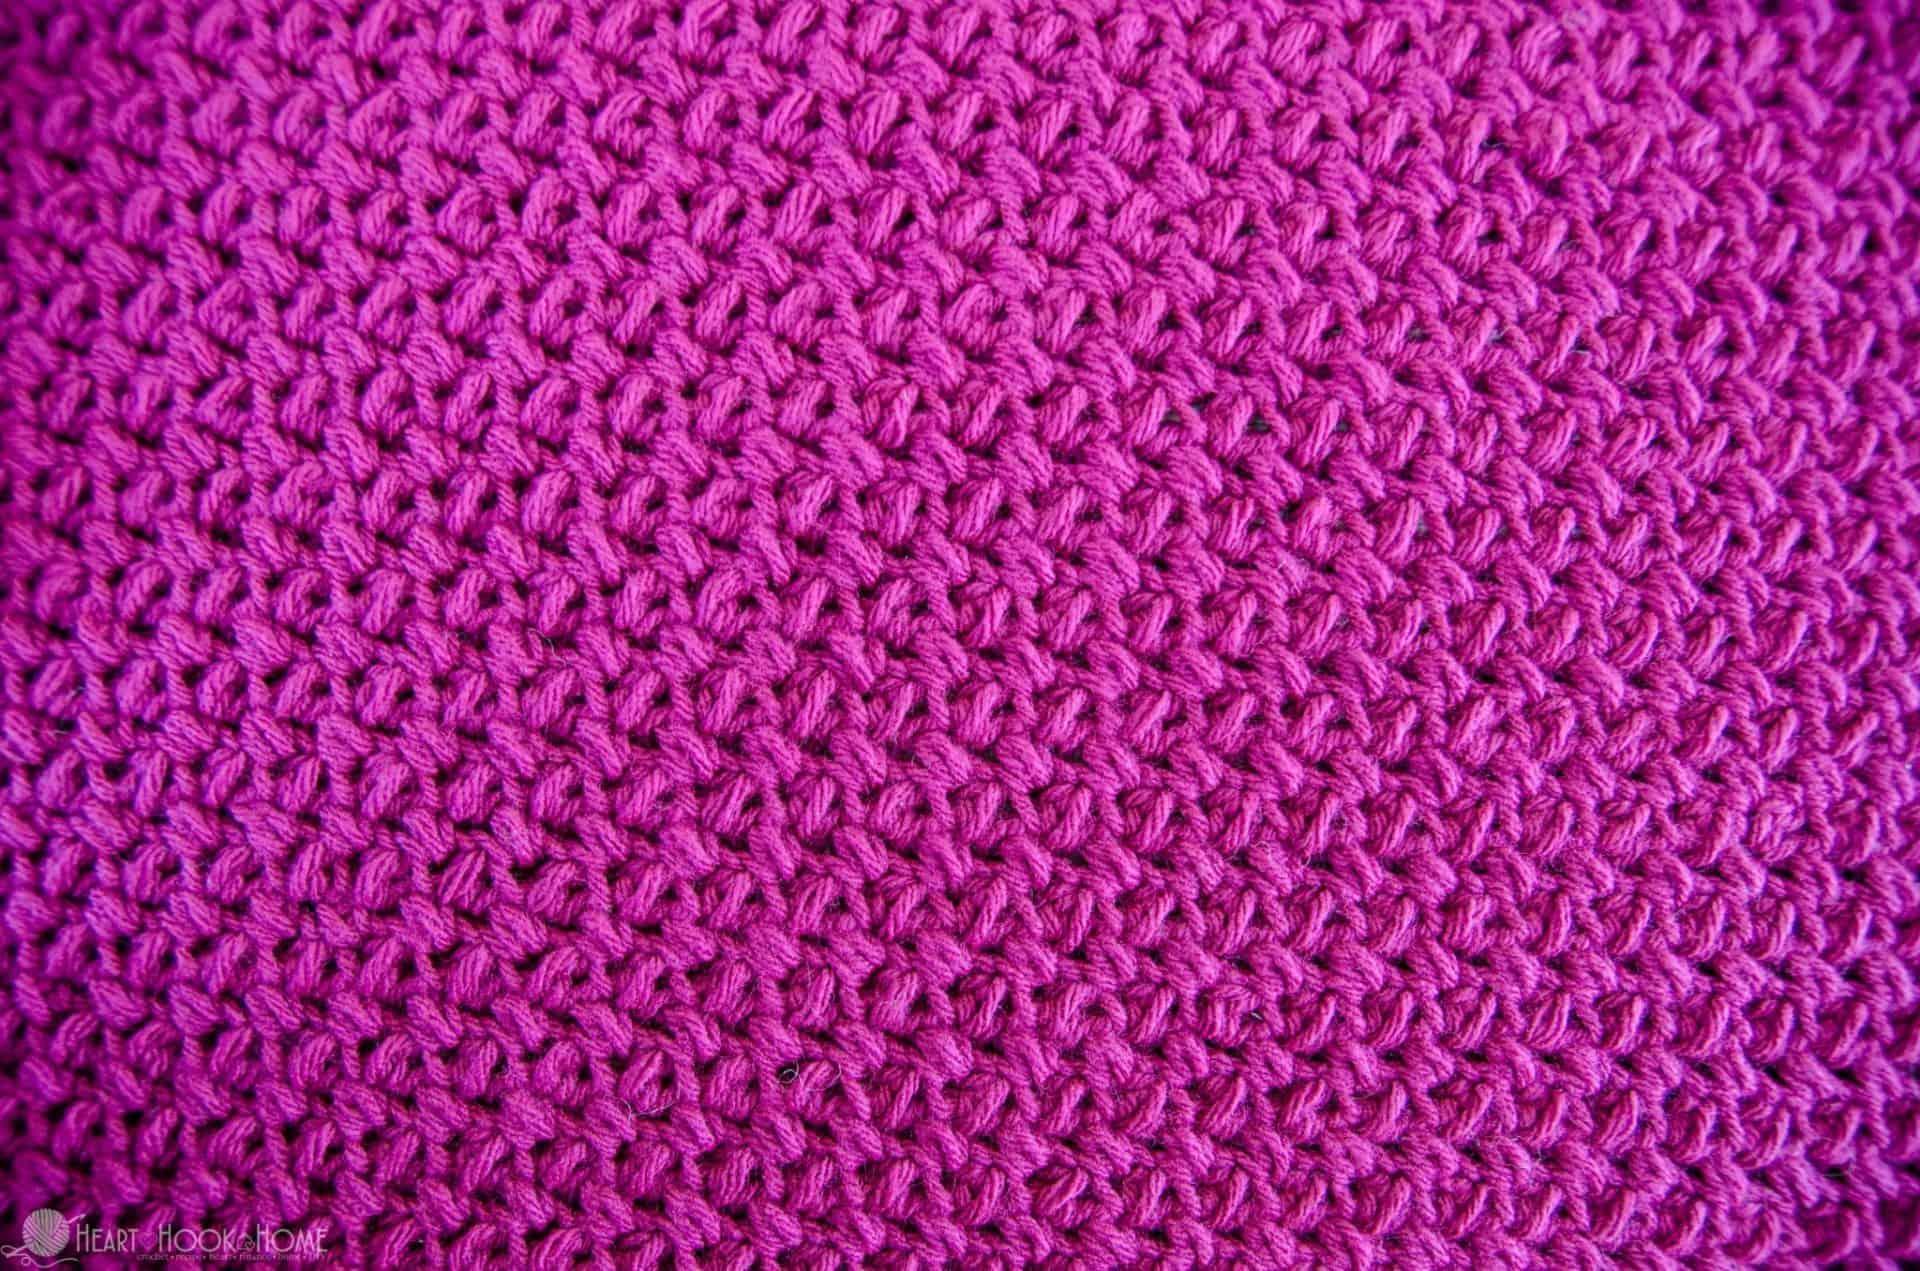 How to crochet the Elizabeth Stitch